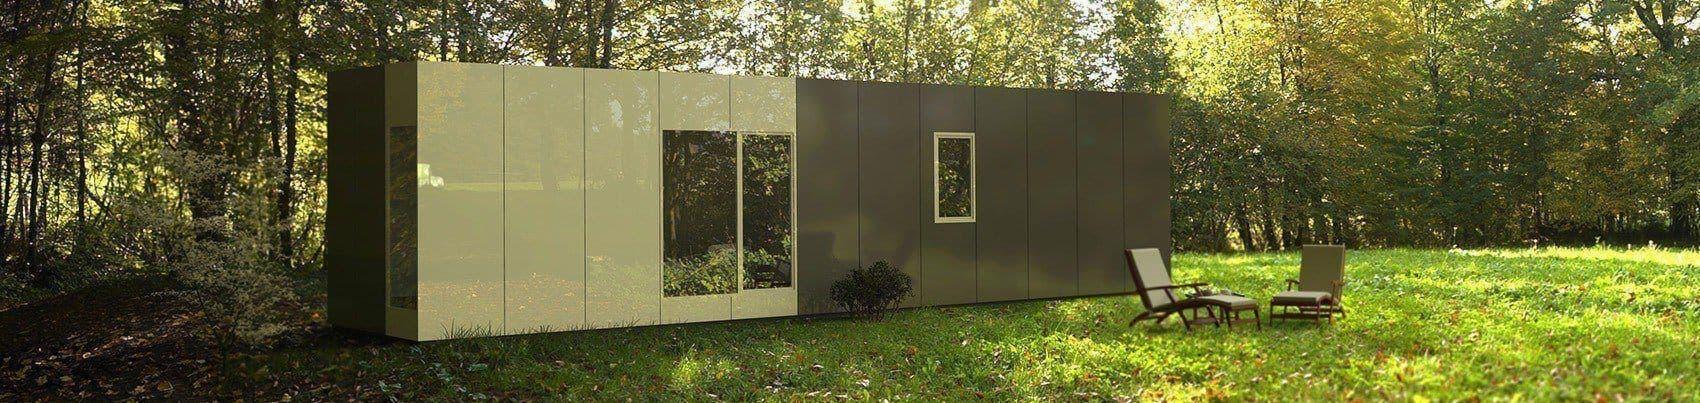 Cube basic 36 casas prefabricadas y modulares cube - Cube casas prefabricadas ...